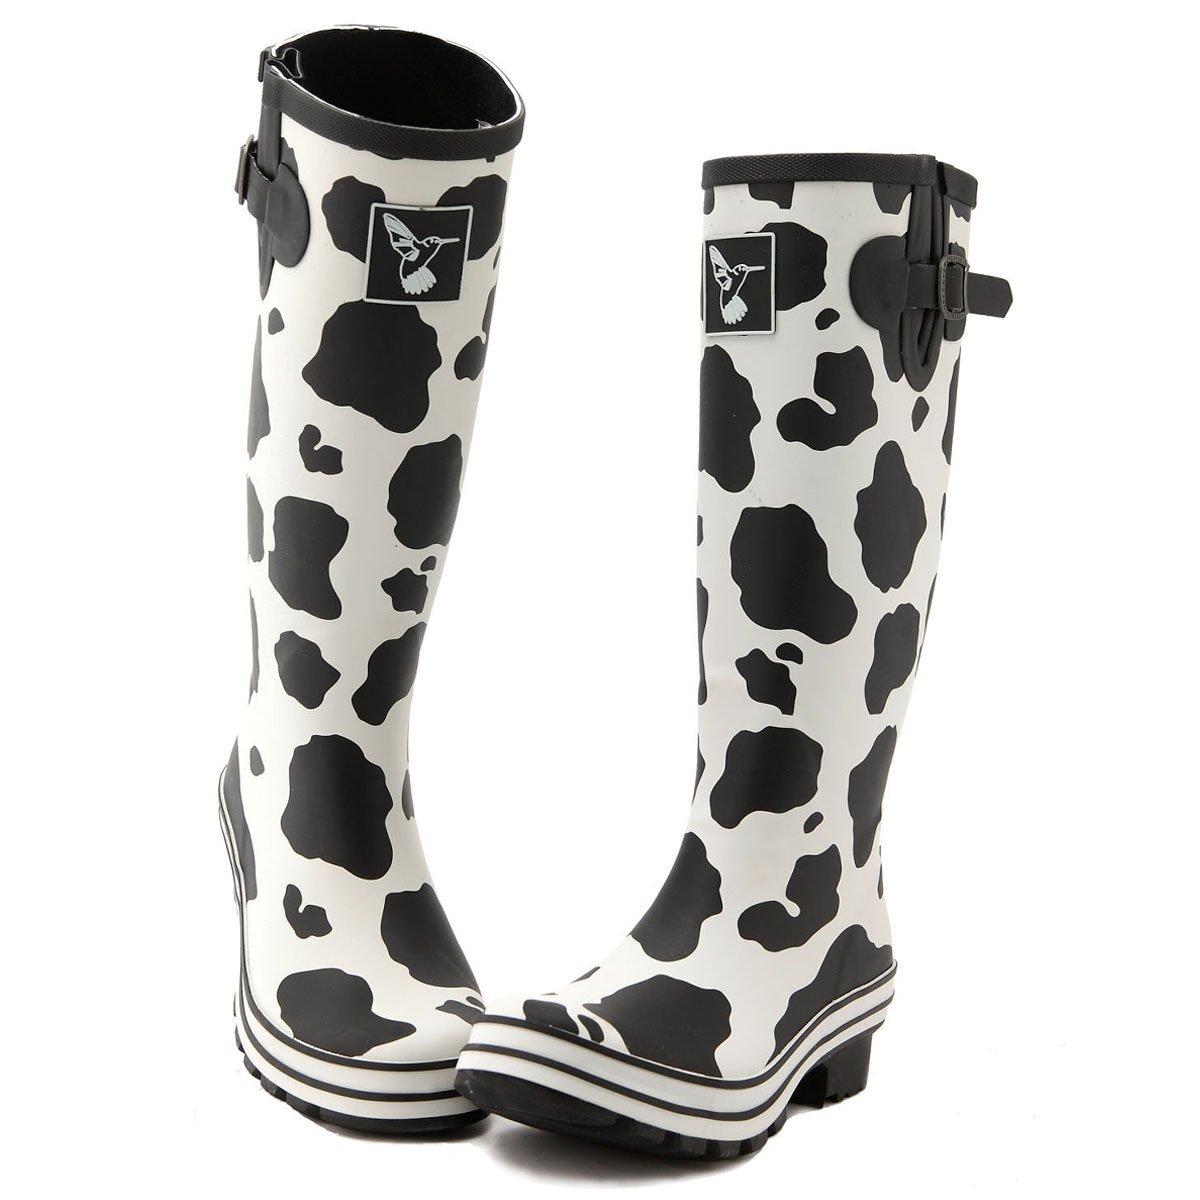 Evercreatures Women's Rain Boots UK Brand Original Tall Rain Boot Gumboots Wellies B008DSC8VK 10 B(M) US / UK8 / EU41|Off-white Print